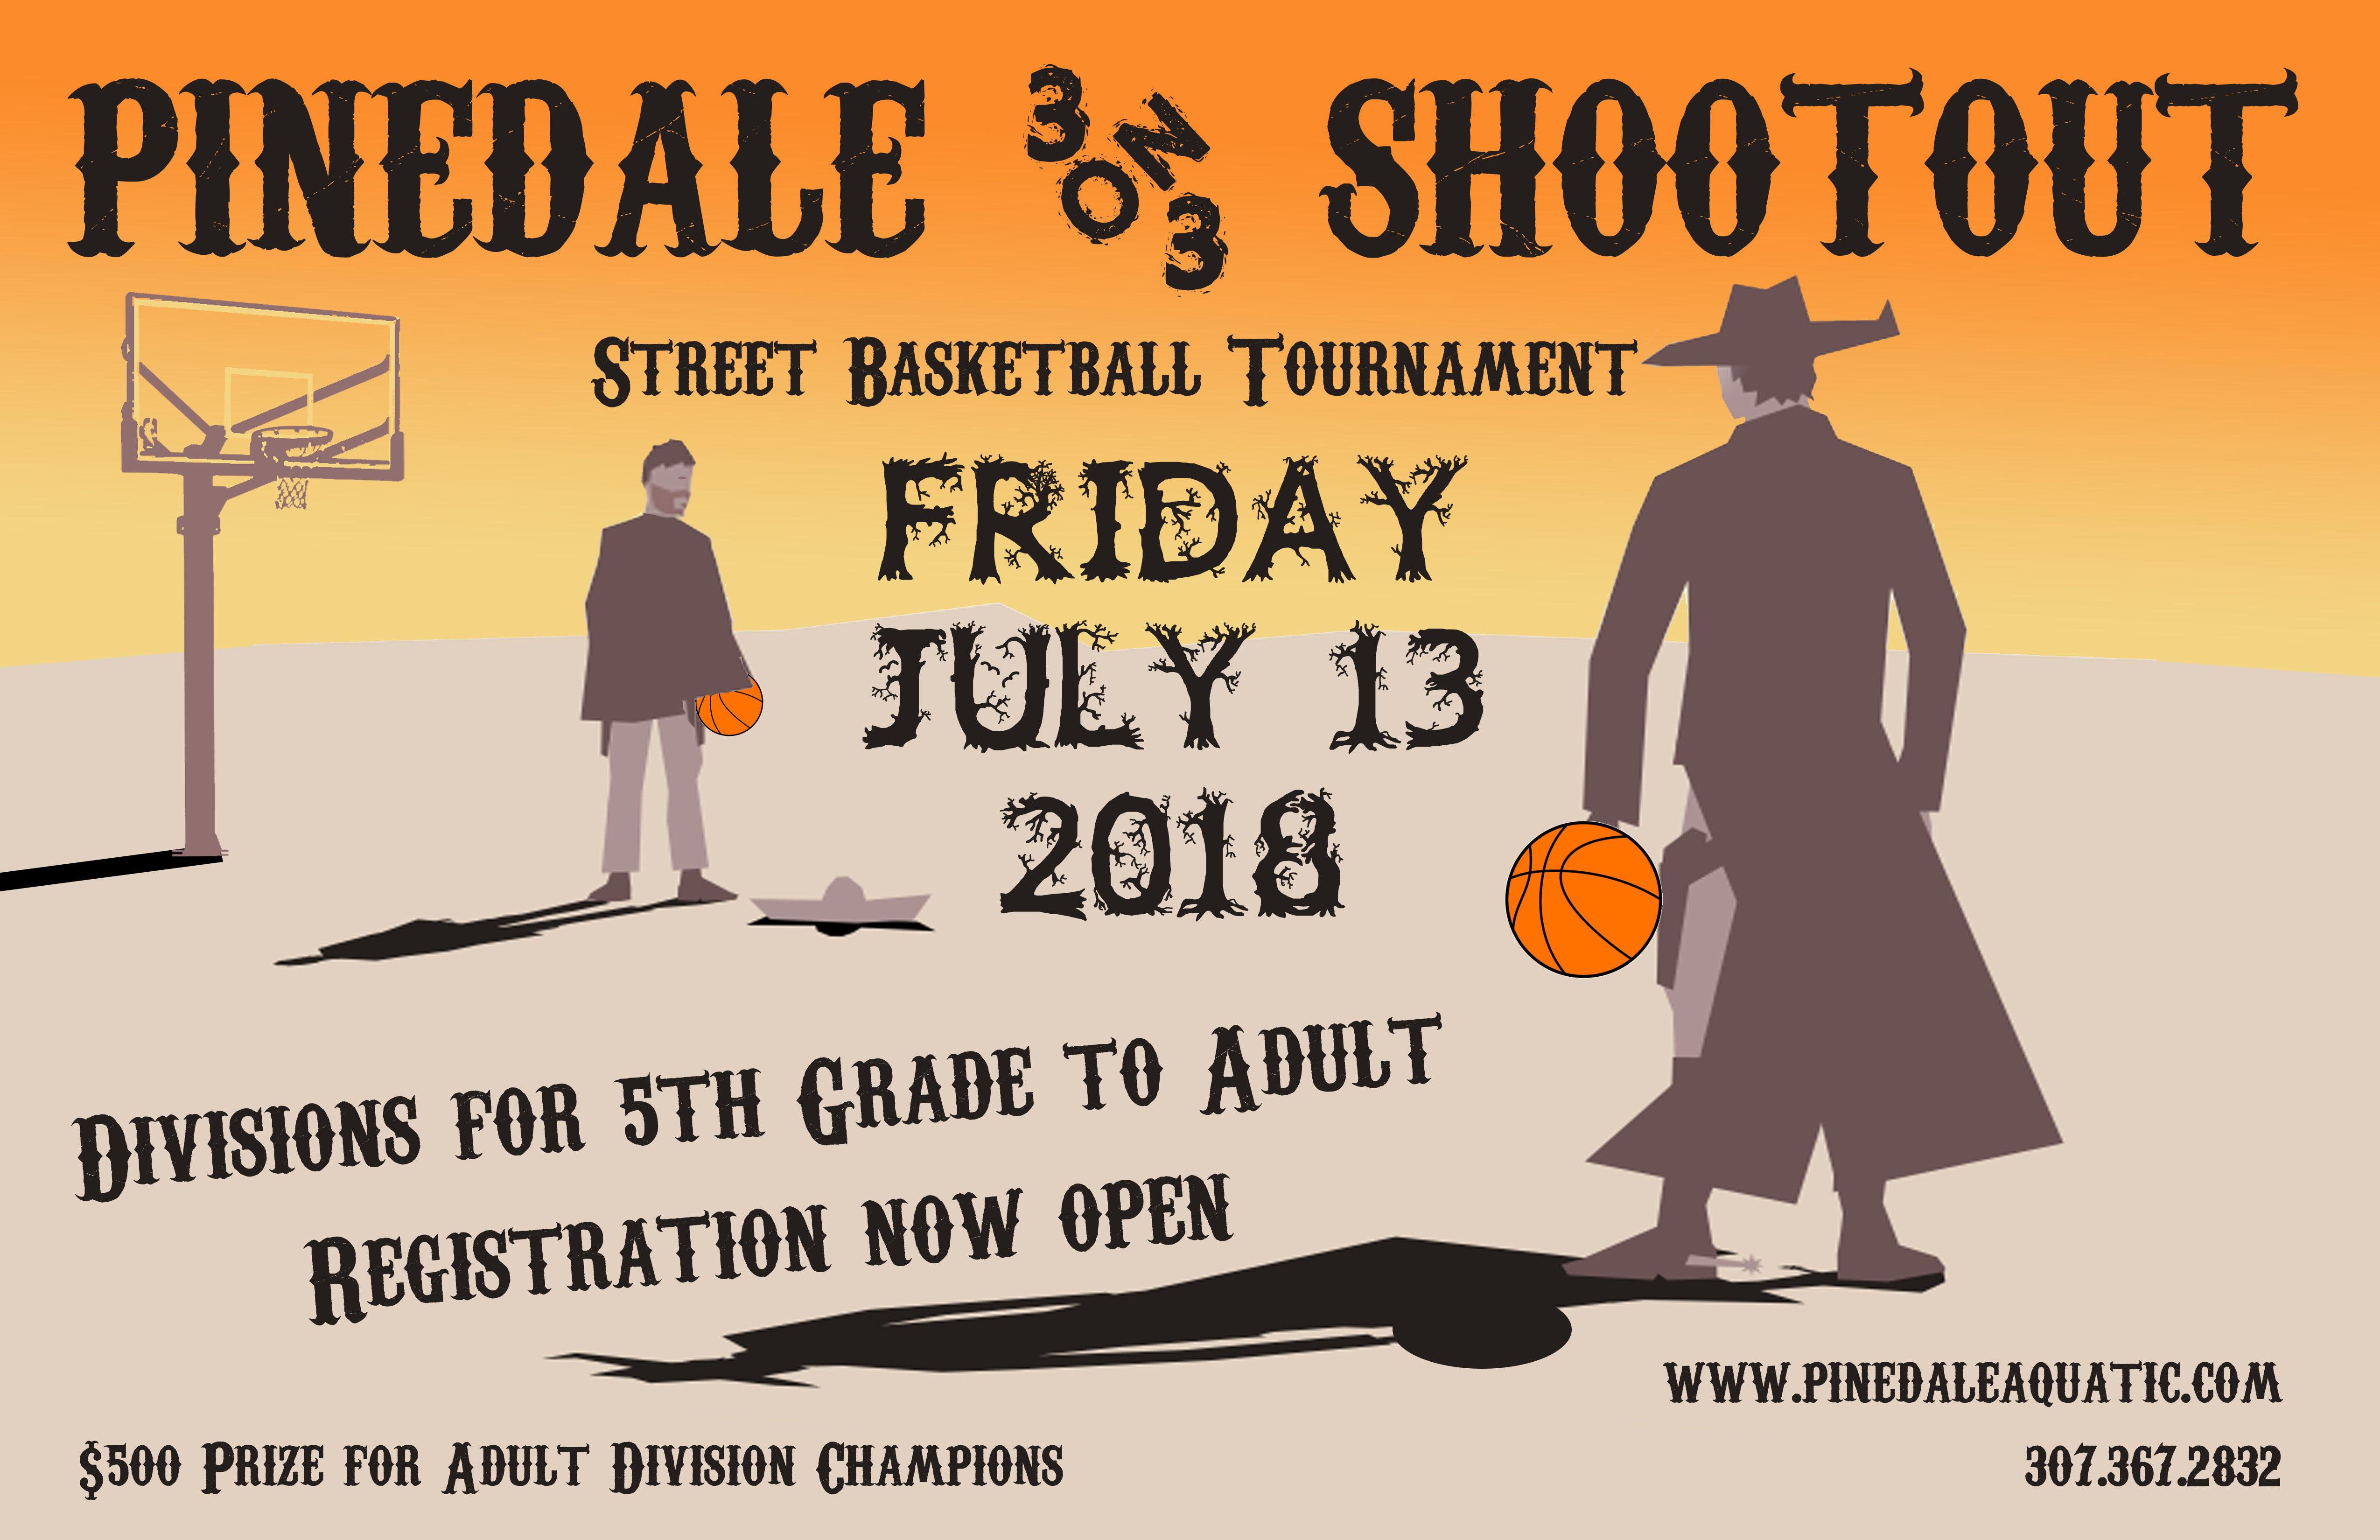 Pinedale 3 on 3 Basketball Shootout